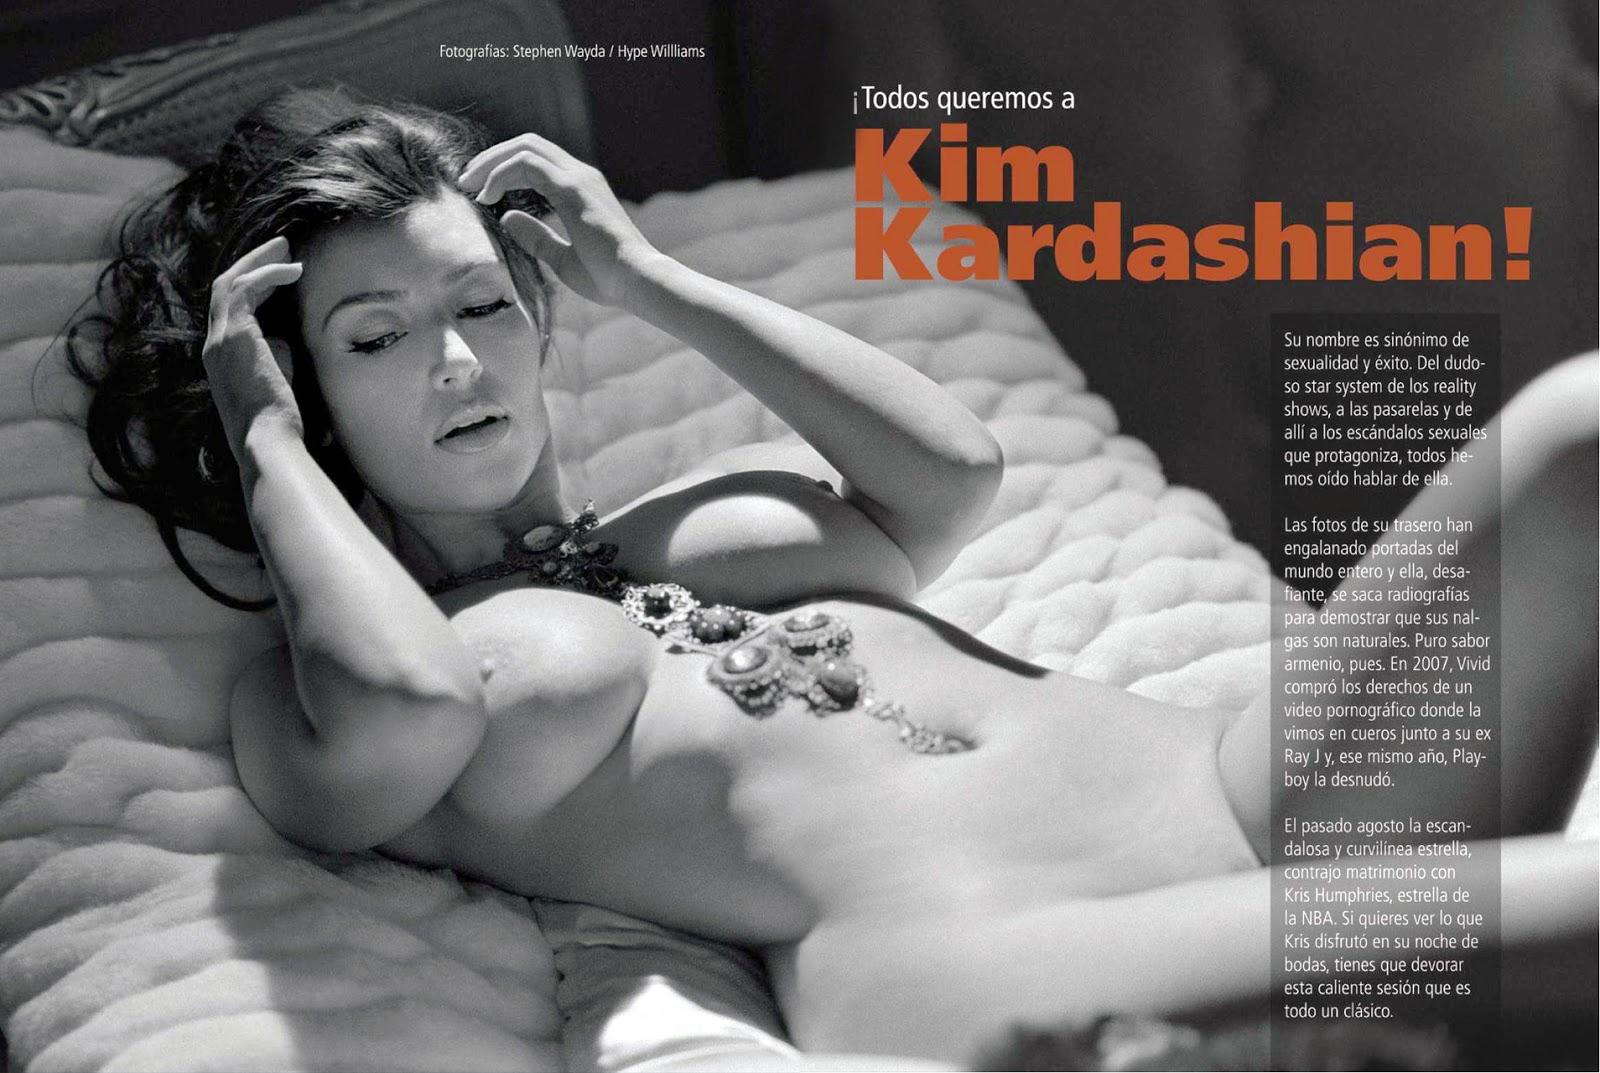 Kim kardashian nude masturbated where